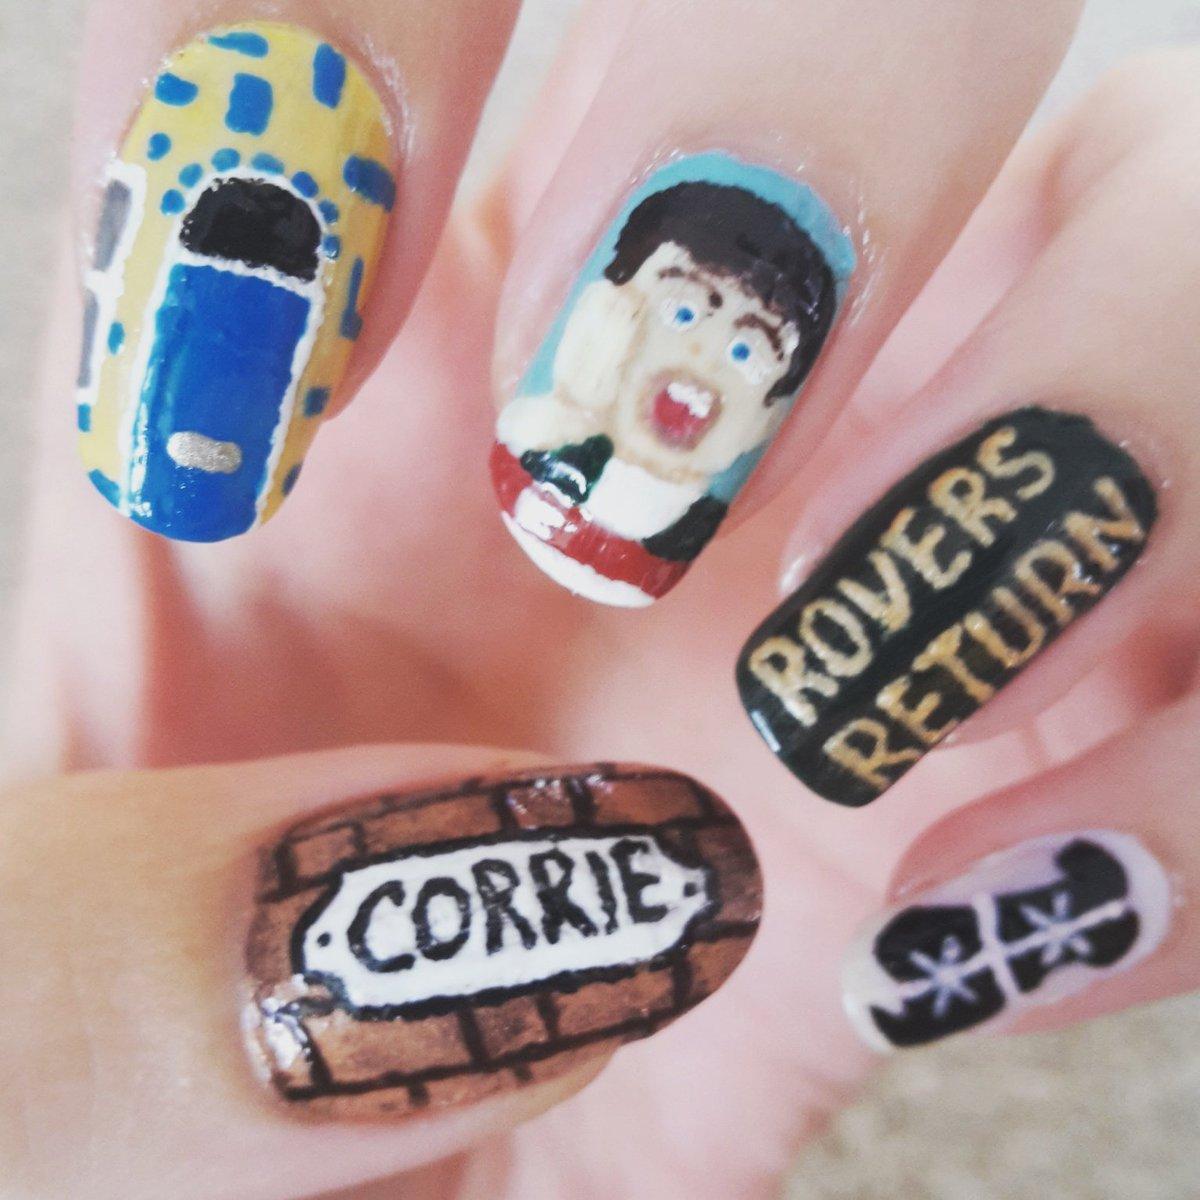 Coronation Street Blog: Fancy some Coronation Street nail art?